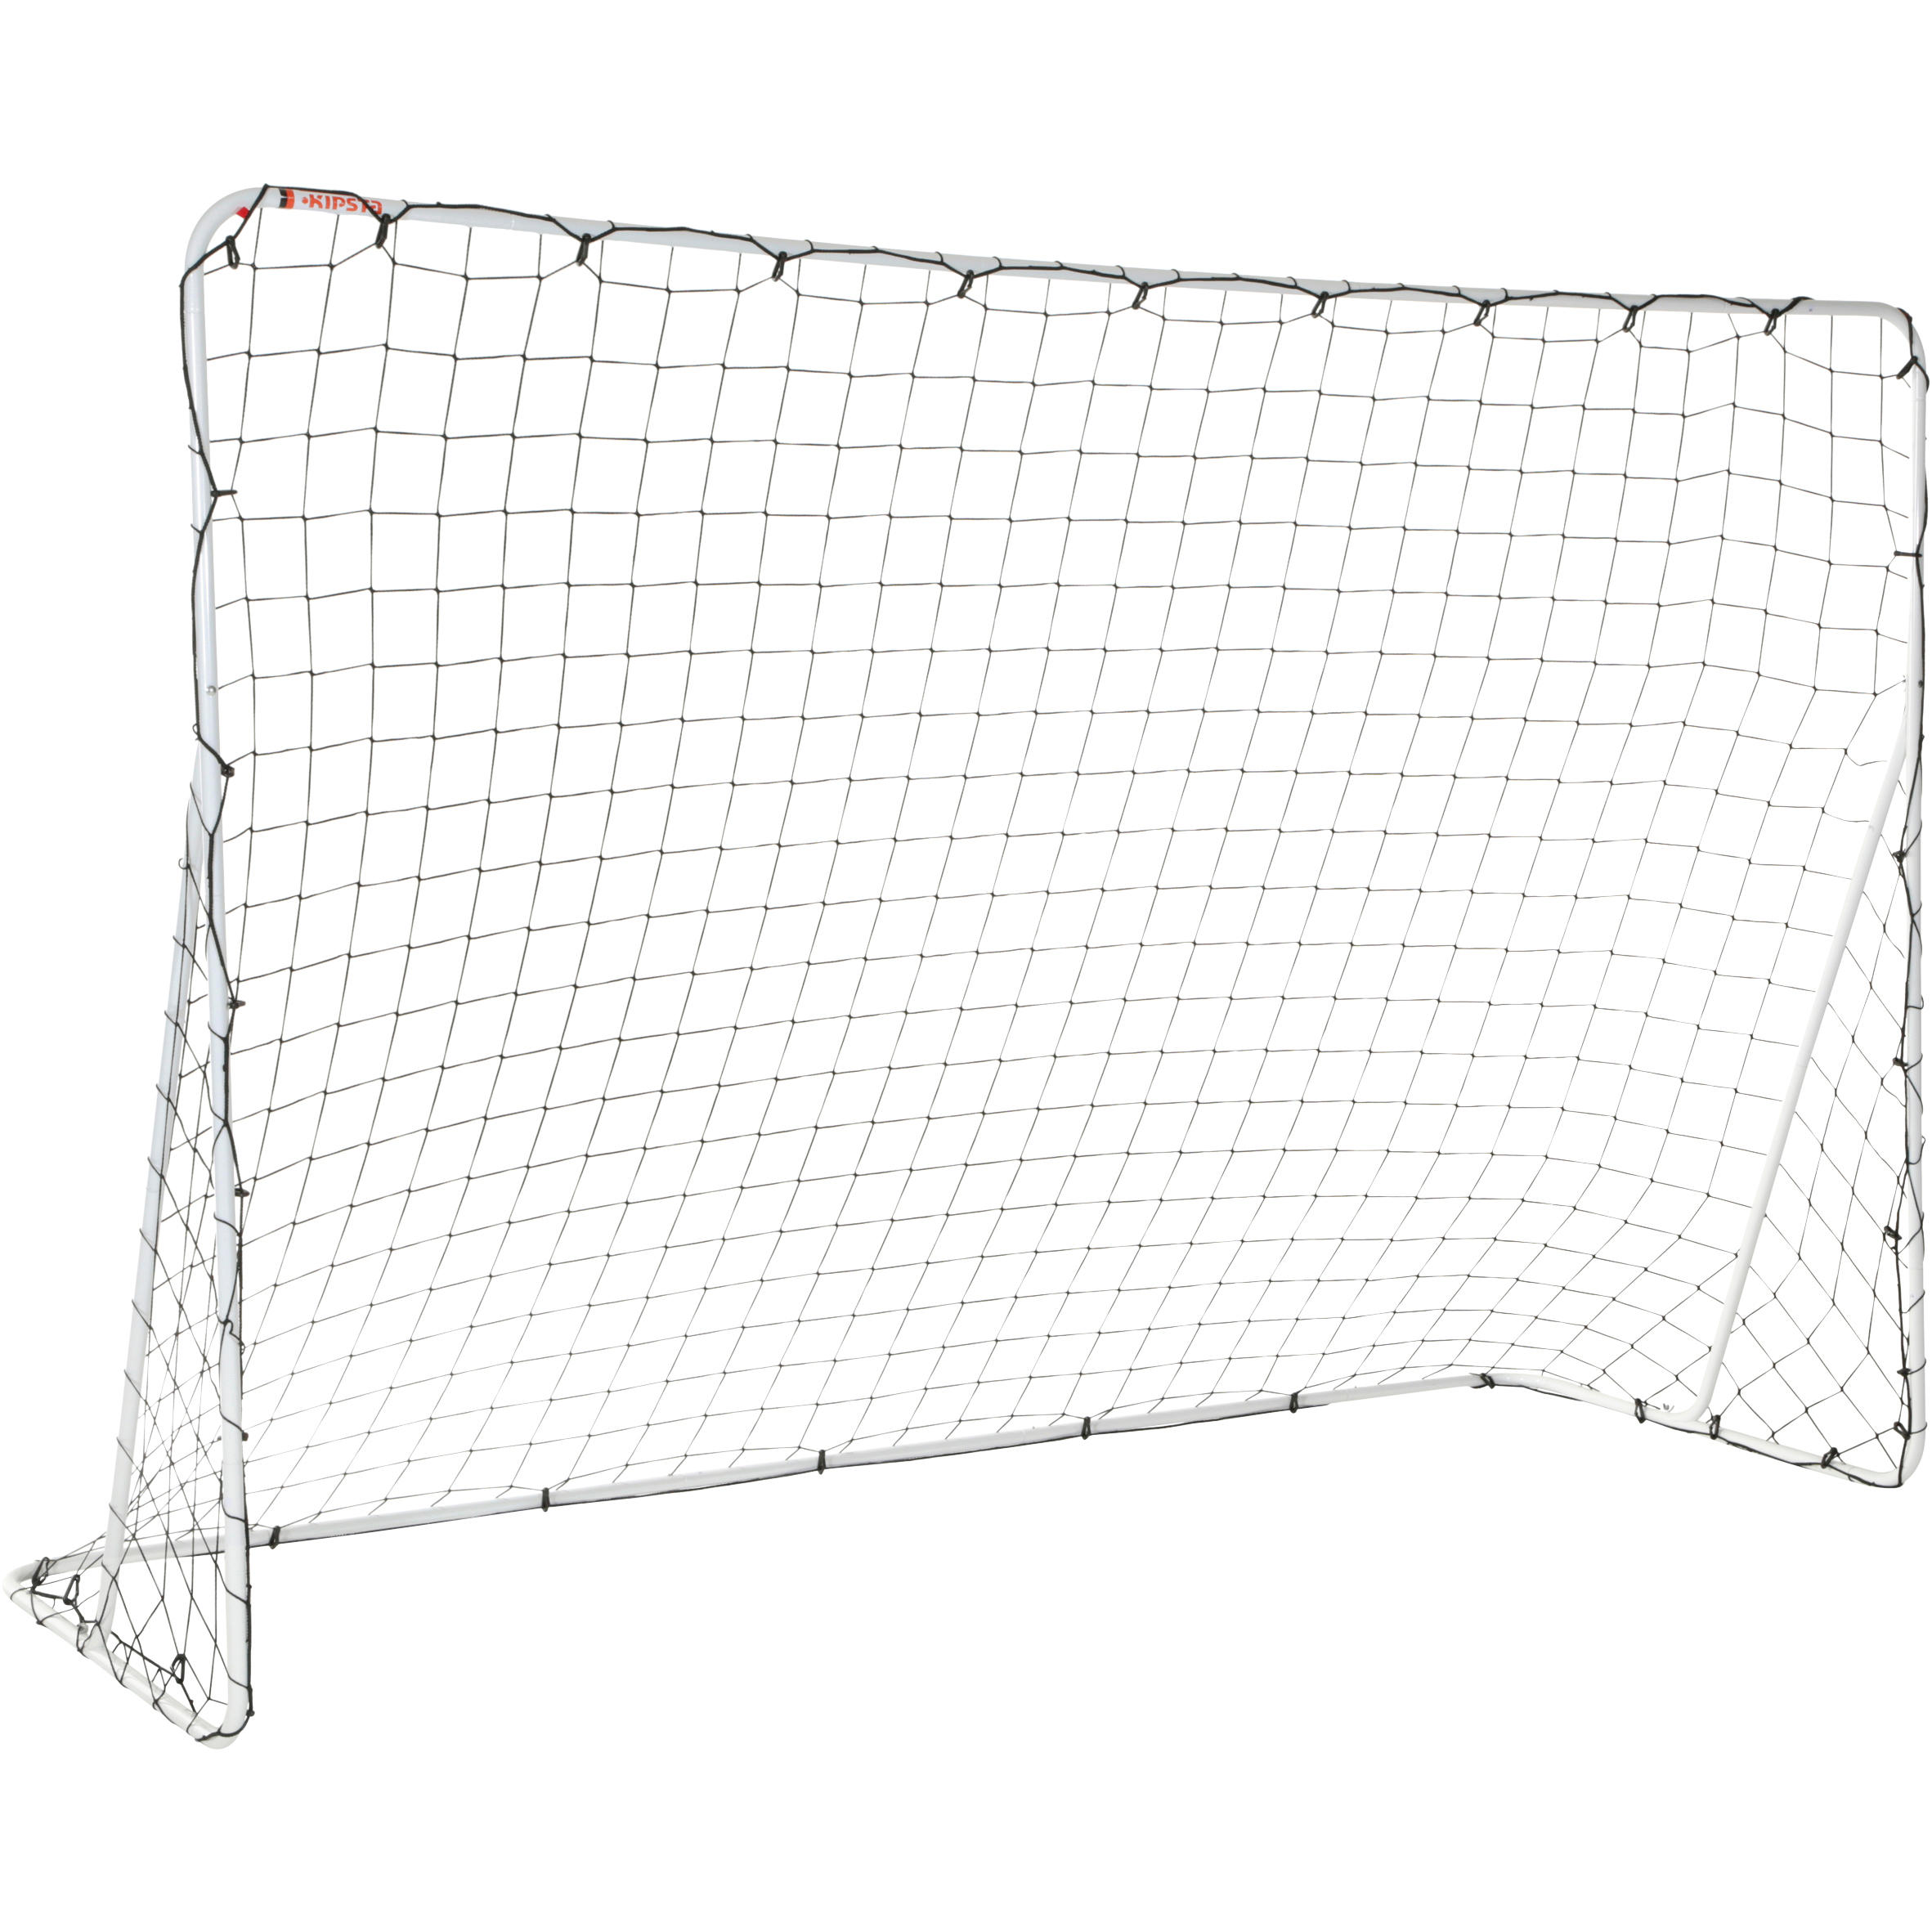 Portería de fútbol Basic Goal L 3 m x 2 m